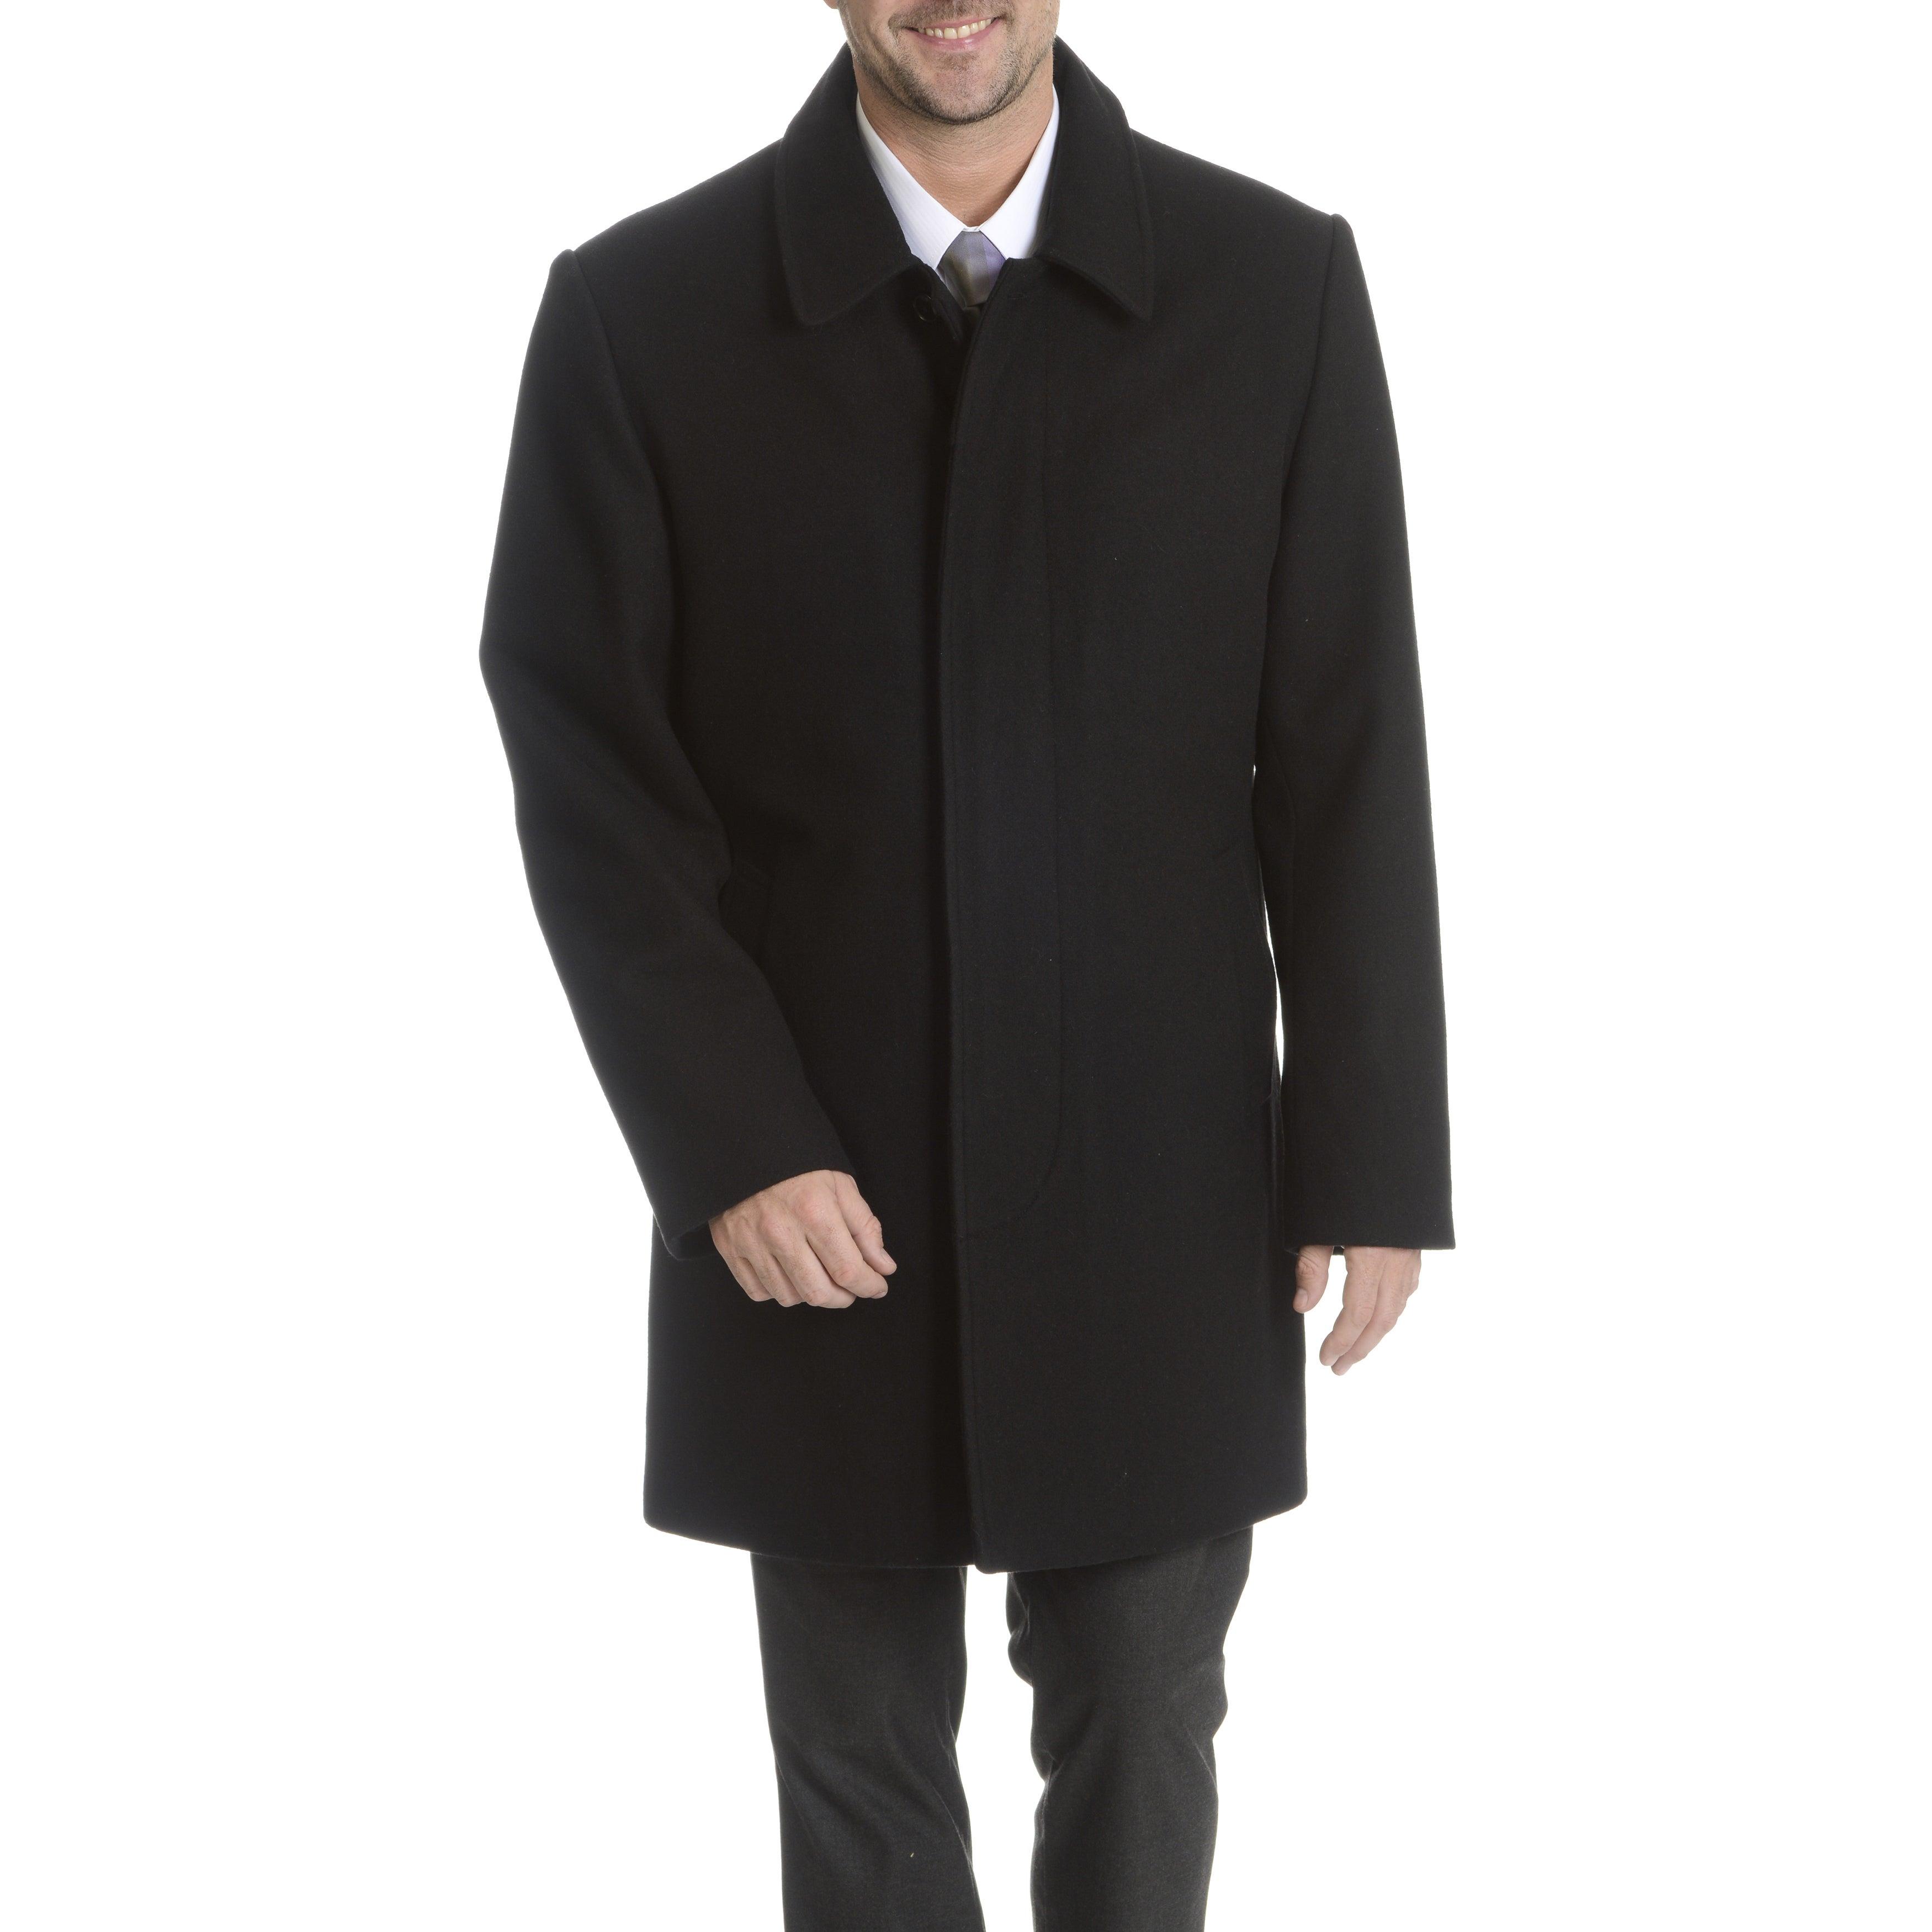 113c9221661 Shop Steve Harvey Men's Topcoat - Free Shipping Today - Overstock - 10991538